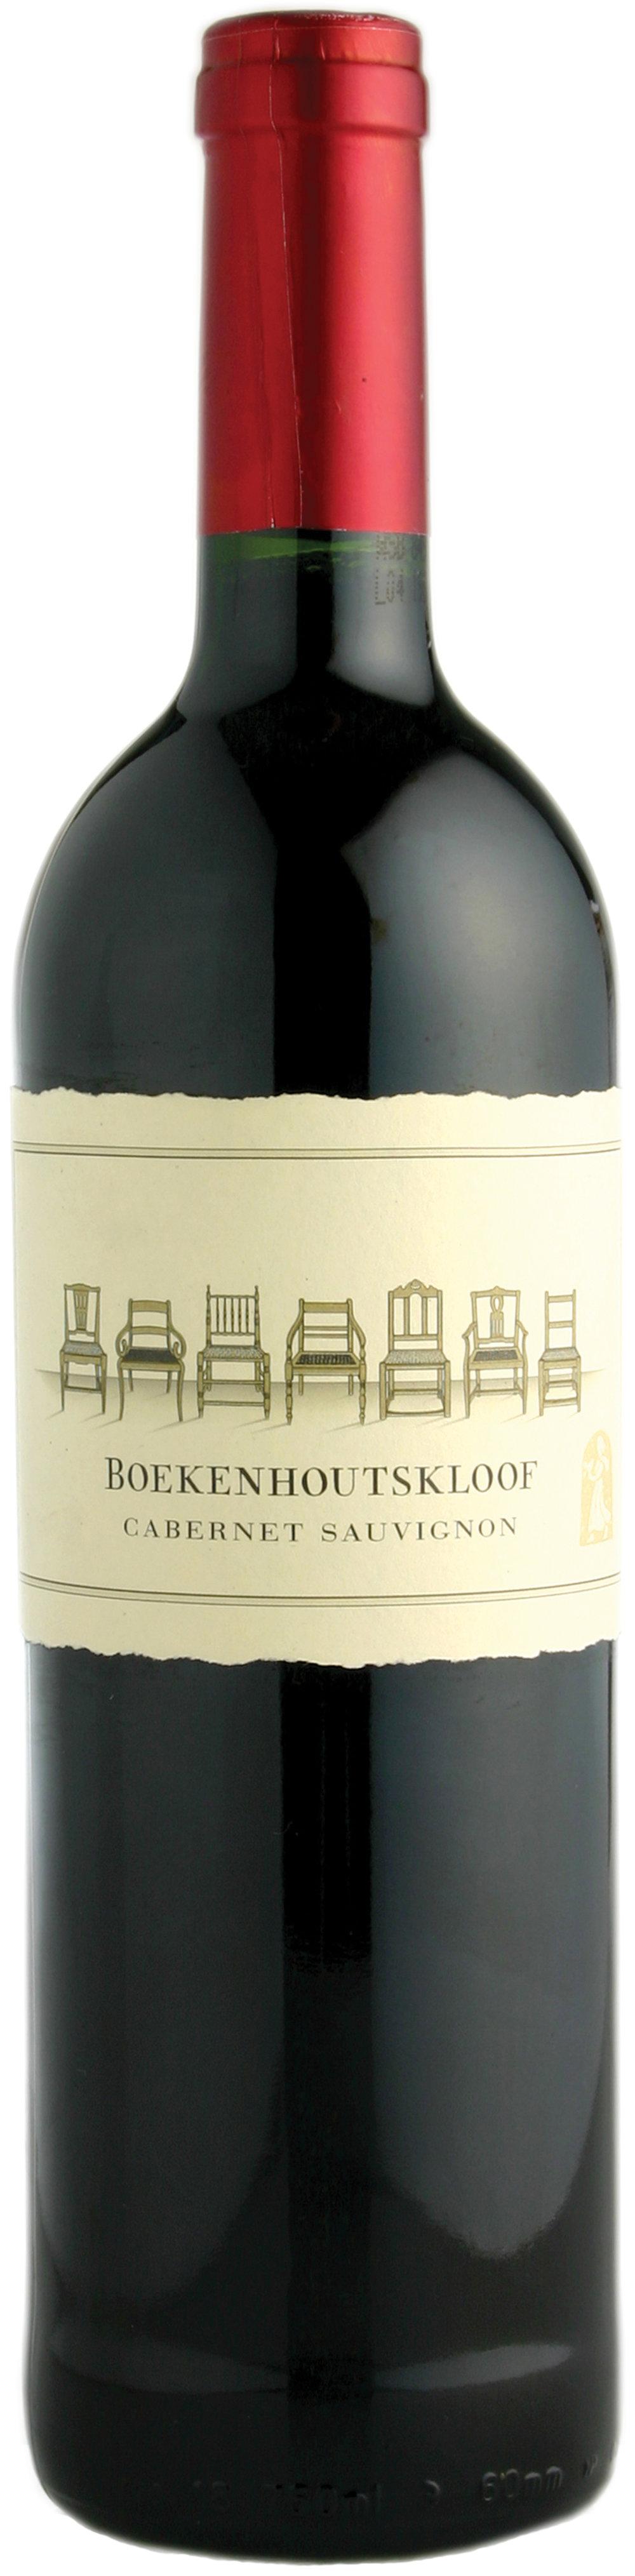 Boekenhoutskloof Cabernet Sauvignon Bottle.jpg